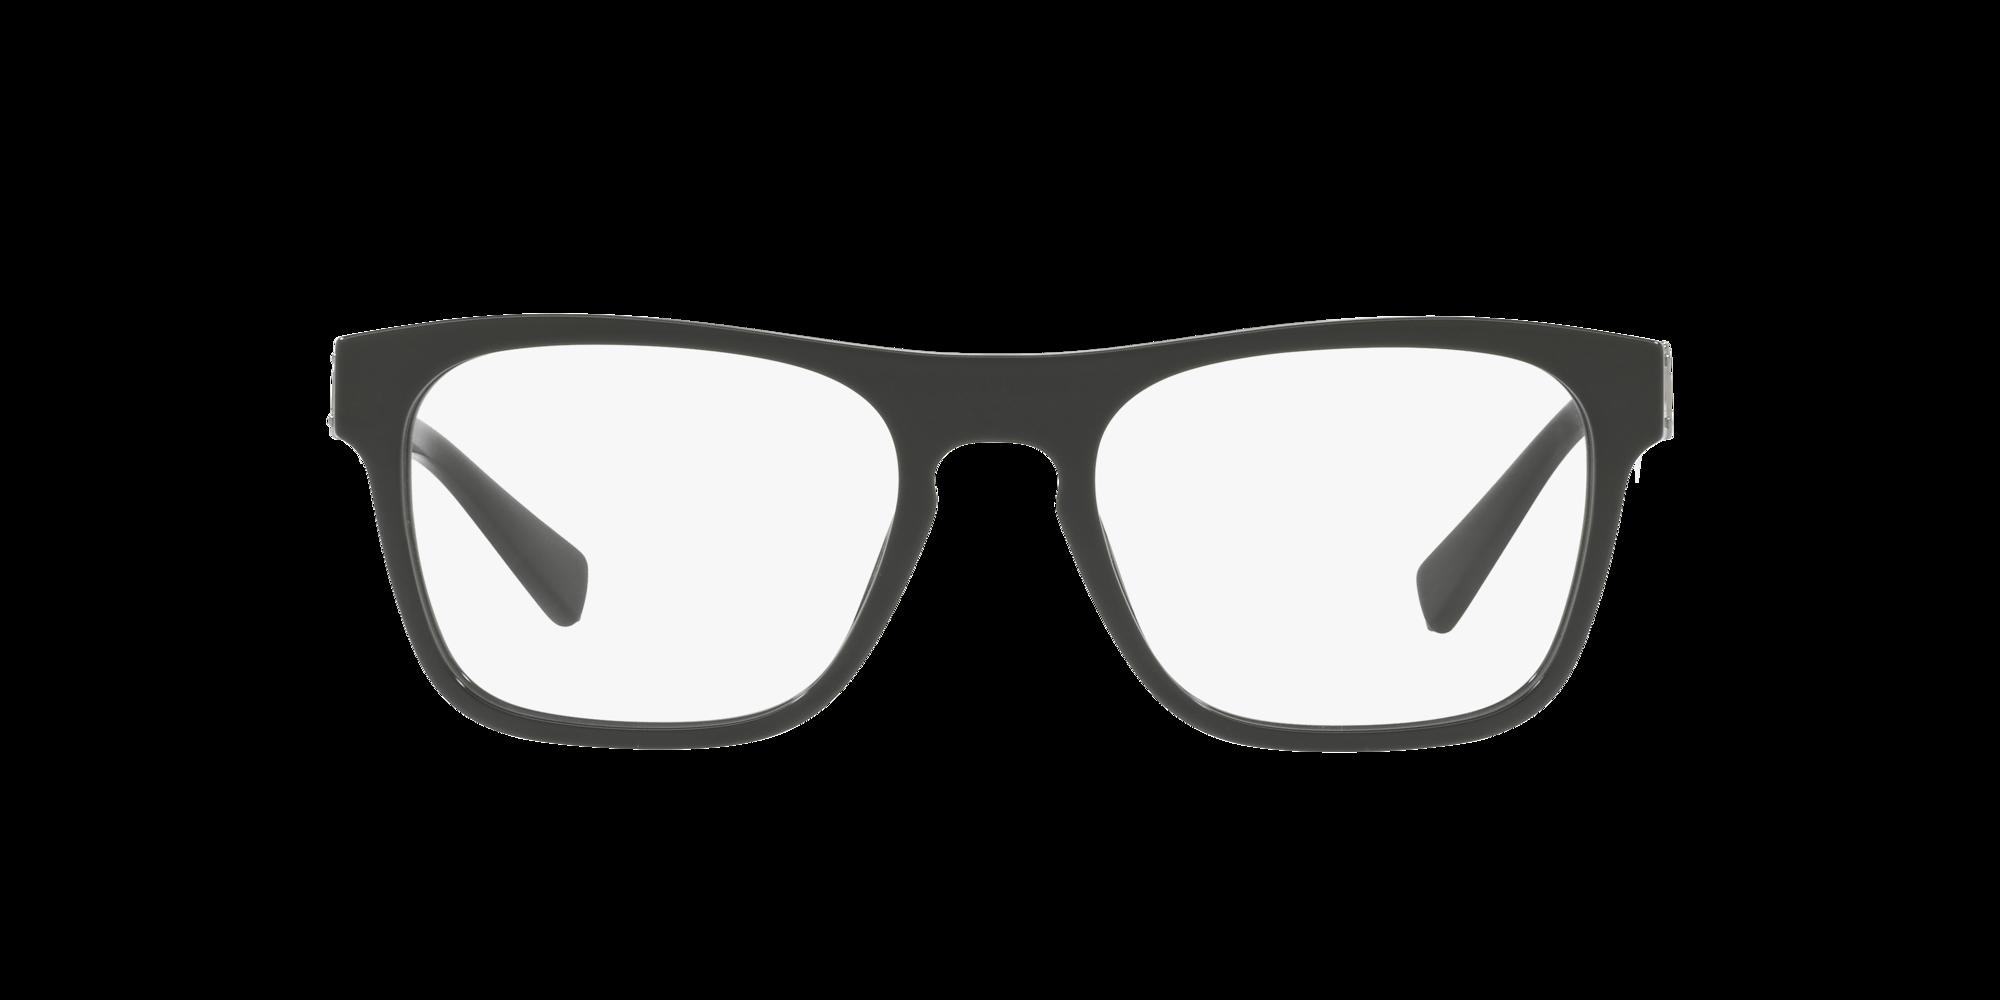 Image for DG3281 from LensCrafters | Glasses, Prescription Glasses Online, Eyewear